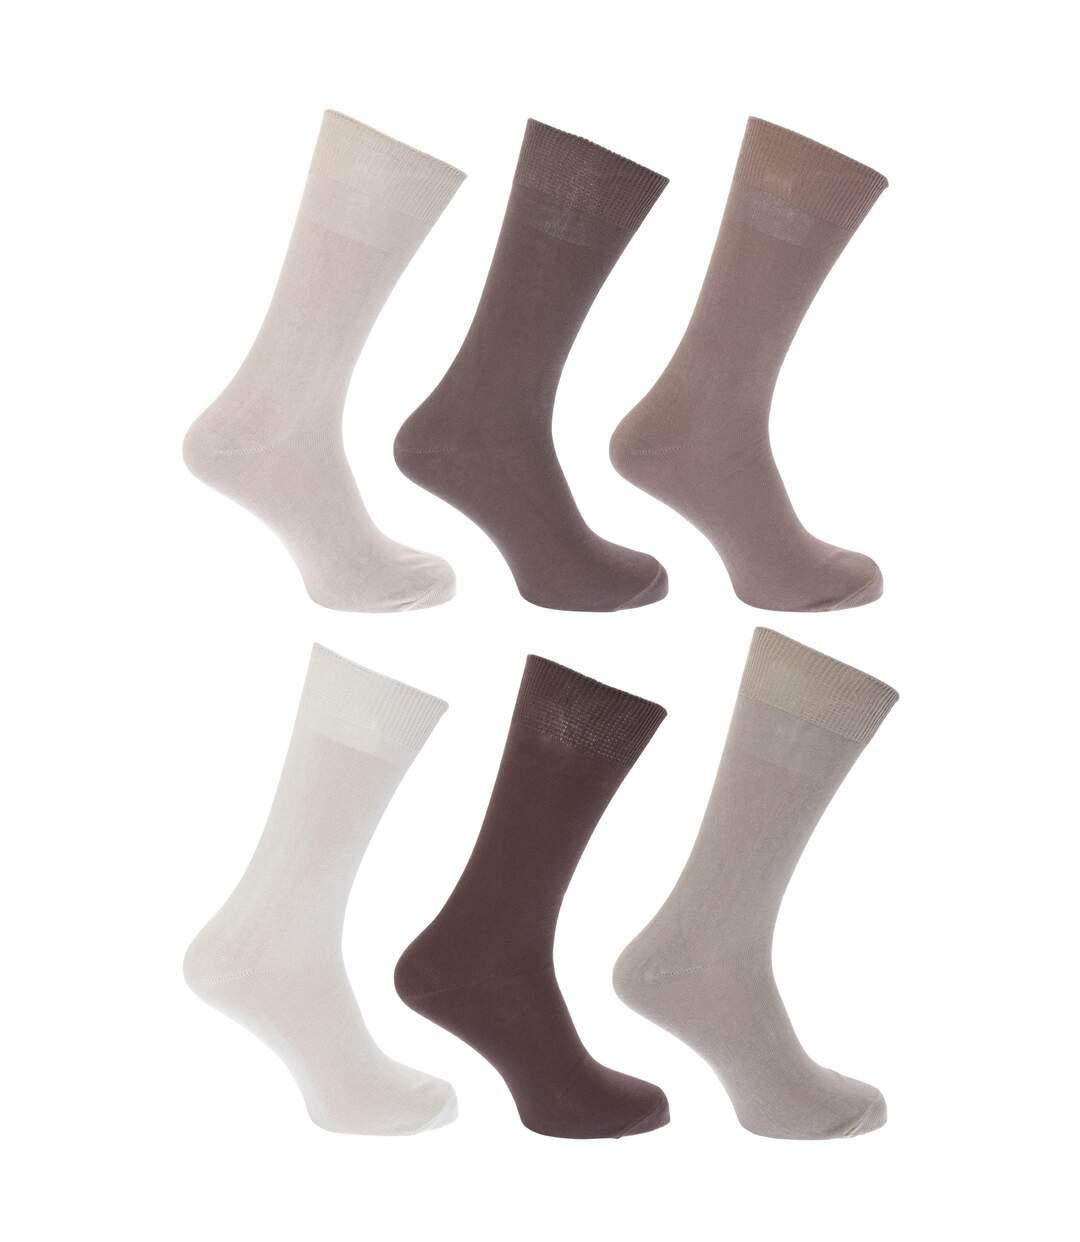 FLOSO Mens Plain 100% Cotton Socks (Pack Of 6) (Shades of Brown) - UTMB183